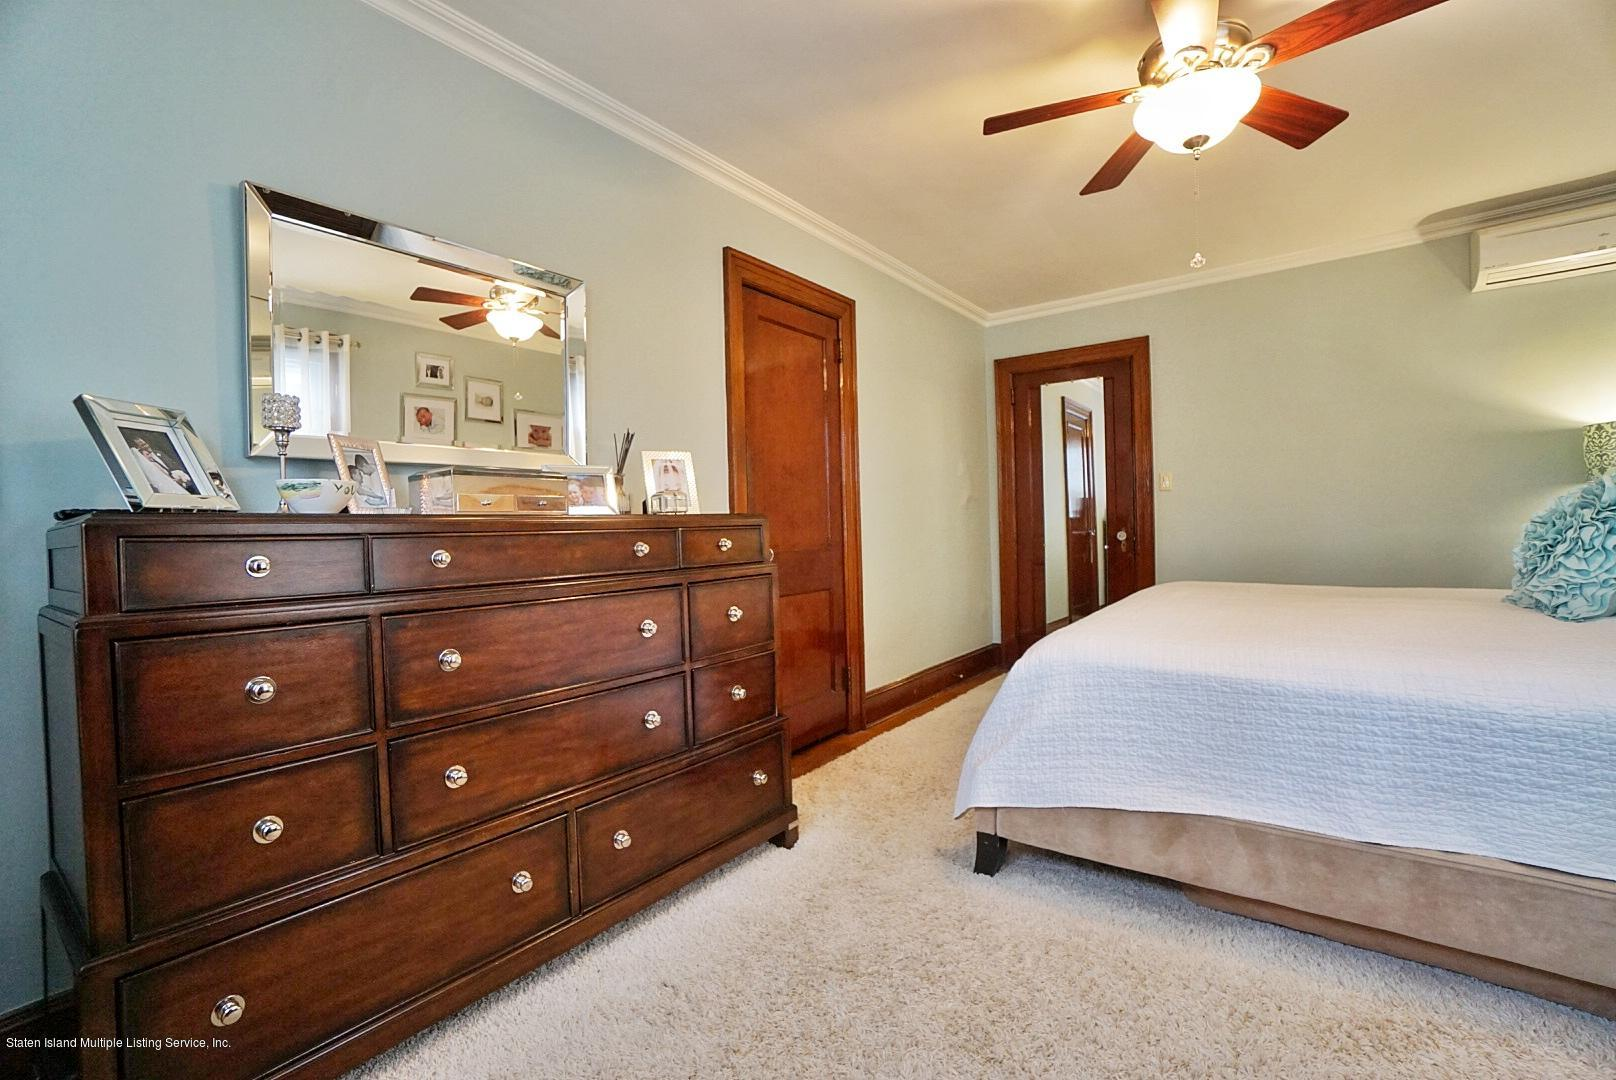 Single Family - Detached 171 Keiber Court  Staten Island, NY 10314, MLS-1127425-38